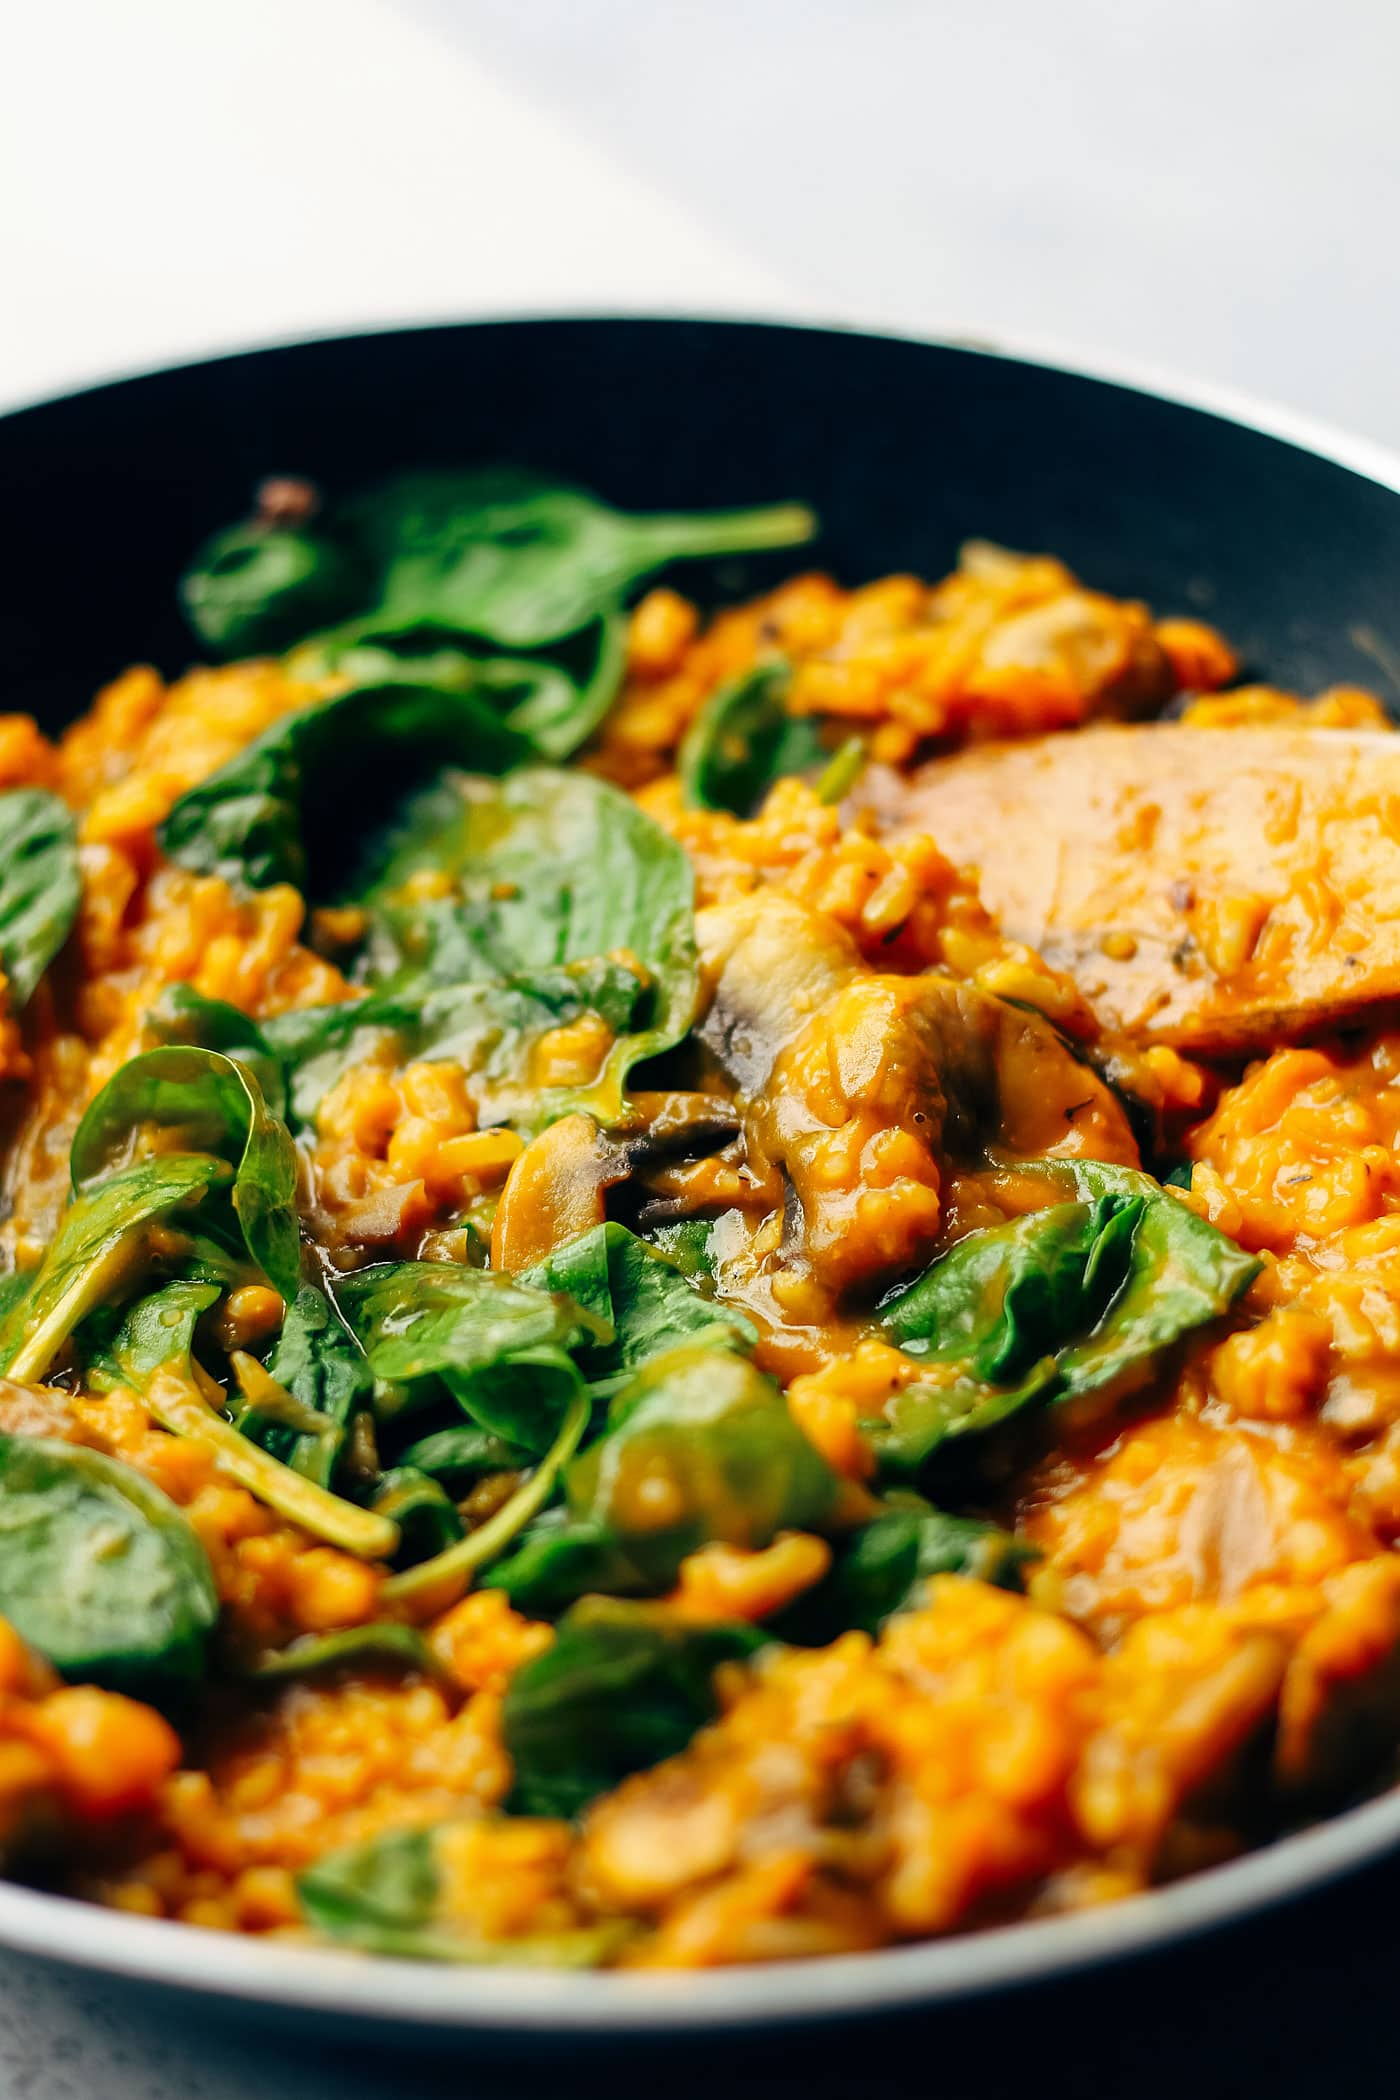 pumpkin-mushroom-rice-omelette-vegan-gluten-free-3